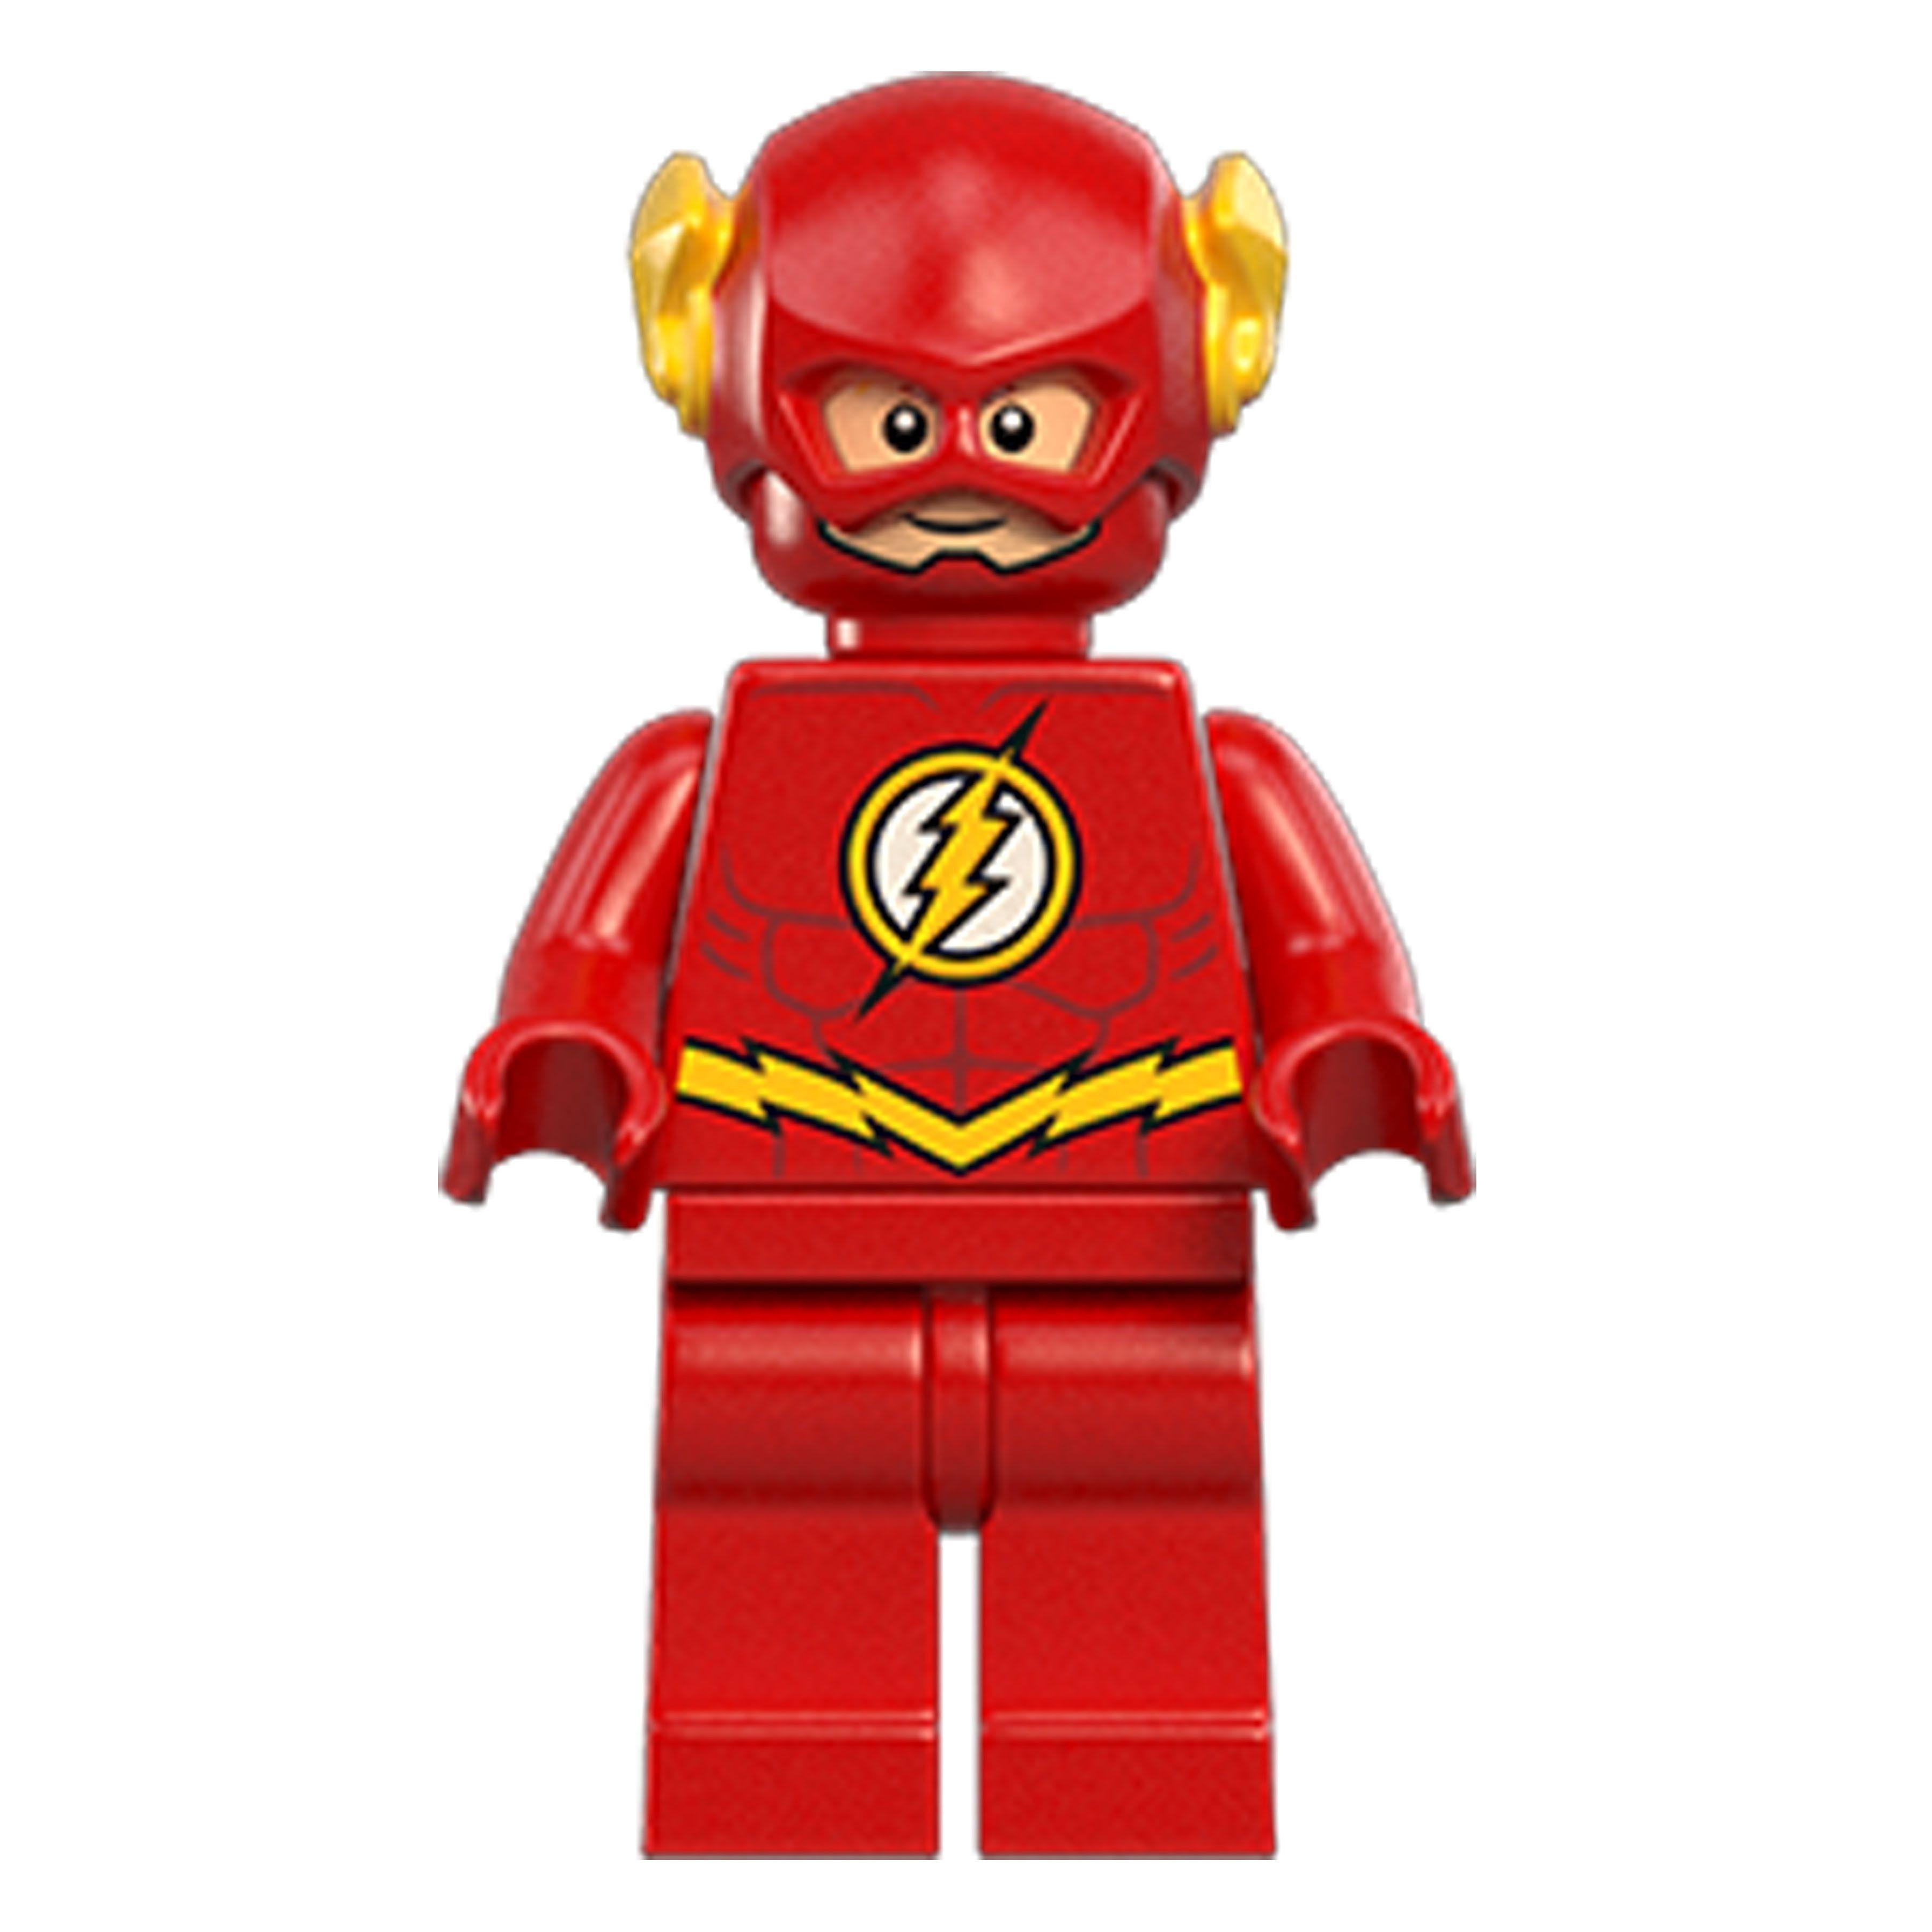 The Flash Minifigure from Lego set 76012 | Lego DC | Pinterest ...